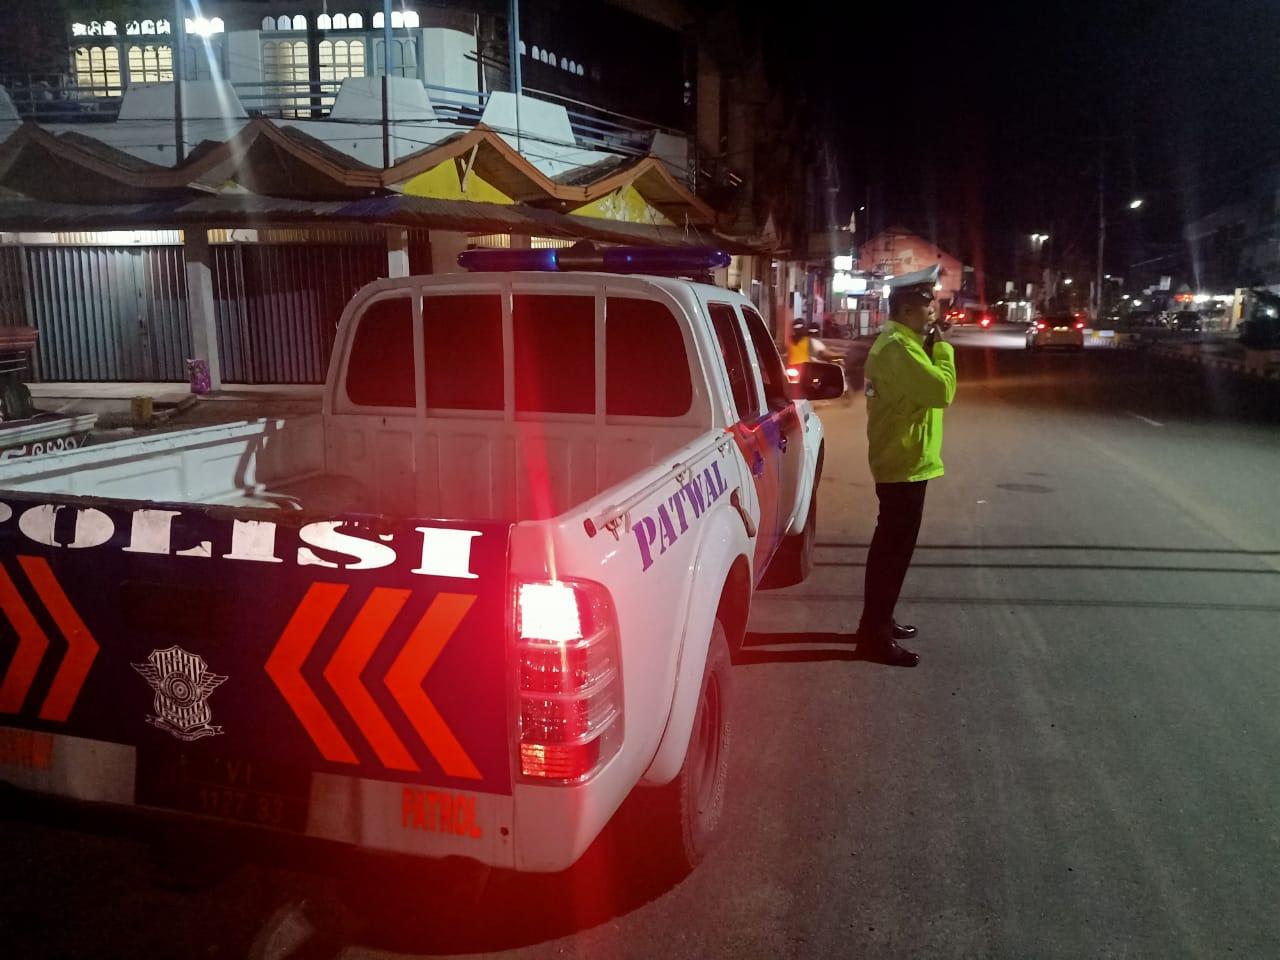 Antisipasi Kejahatan Malam, Sat Lantas Polres Ketapang Melakukan Patroli Rutin